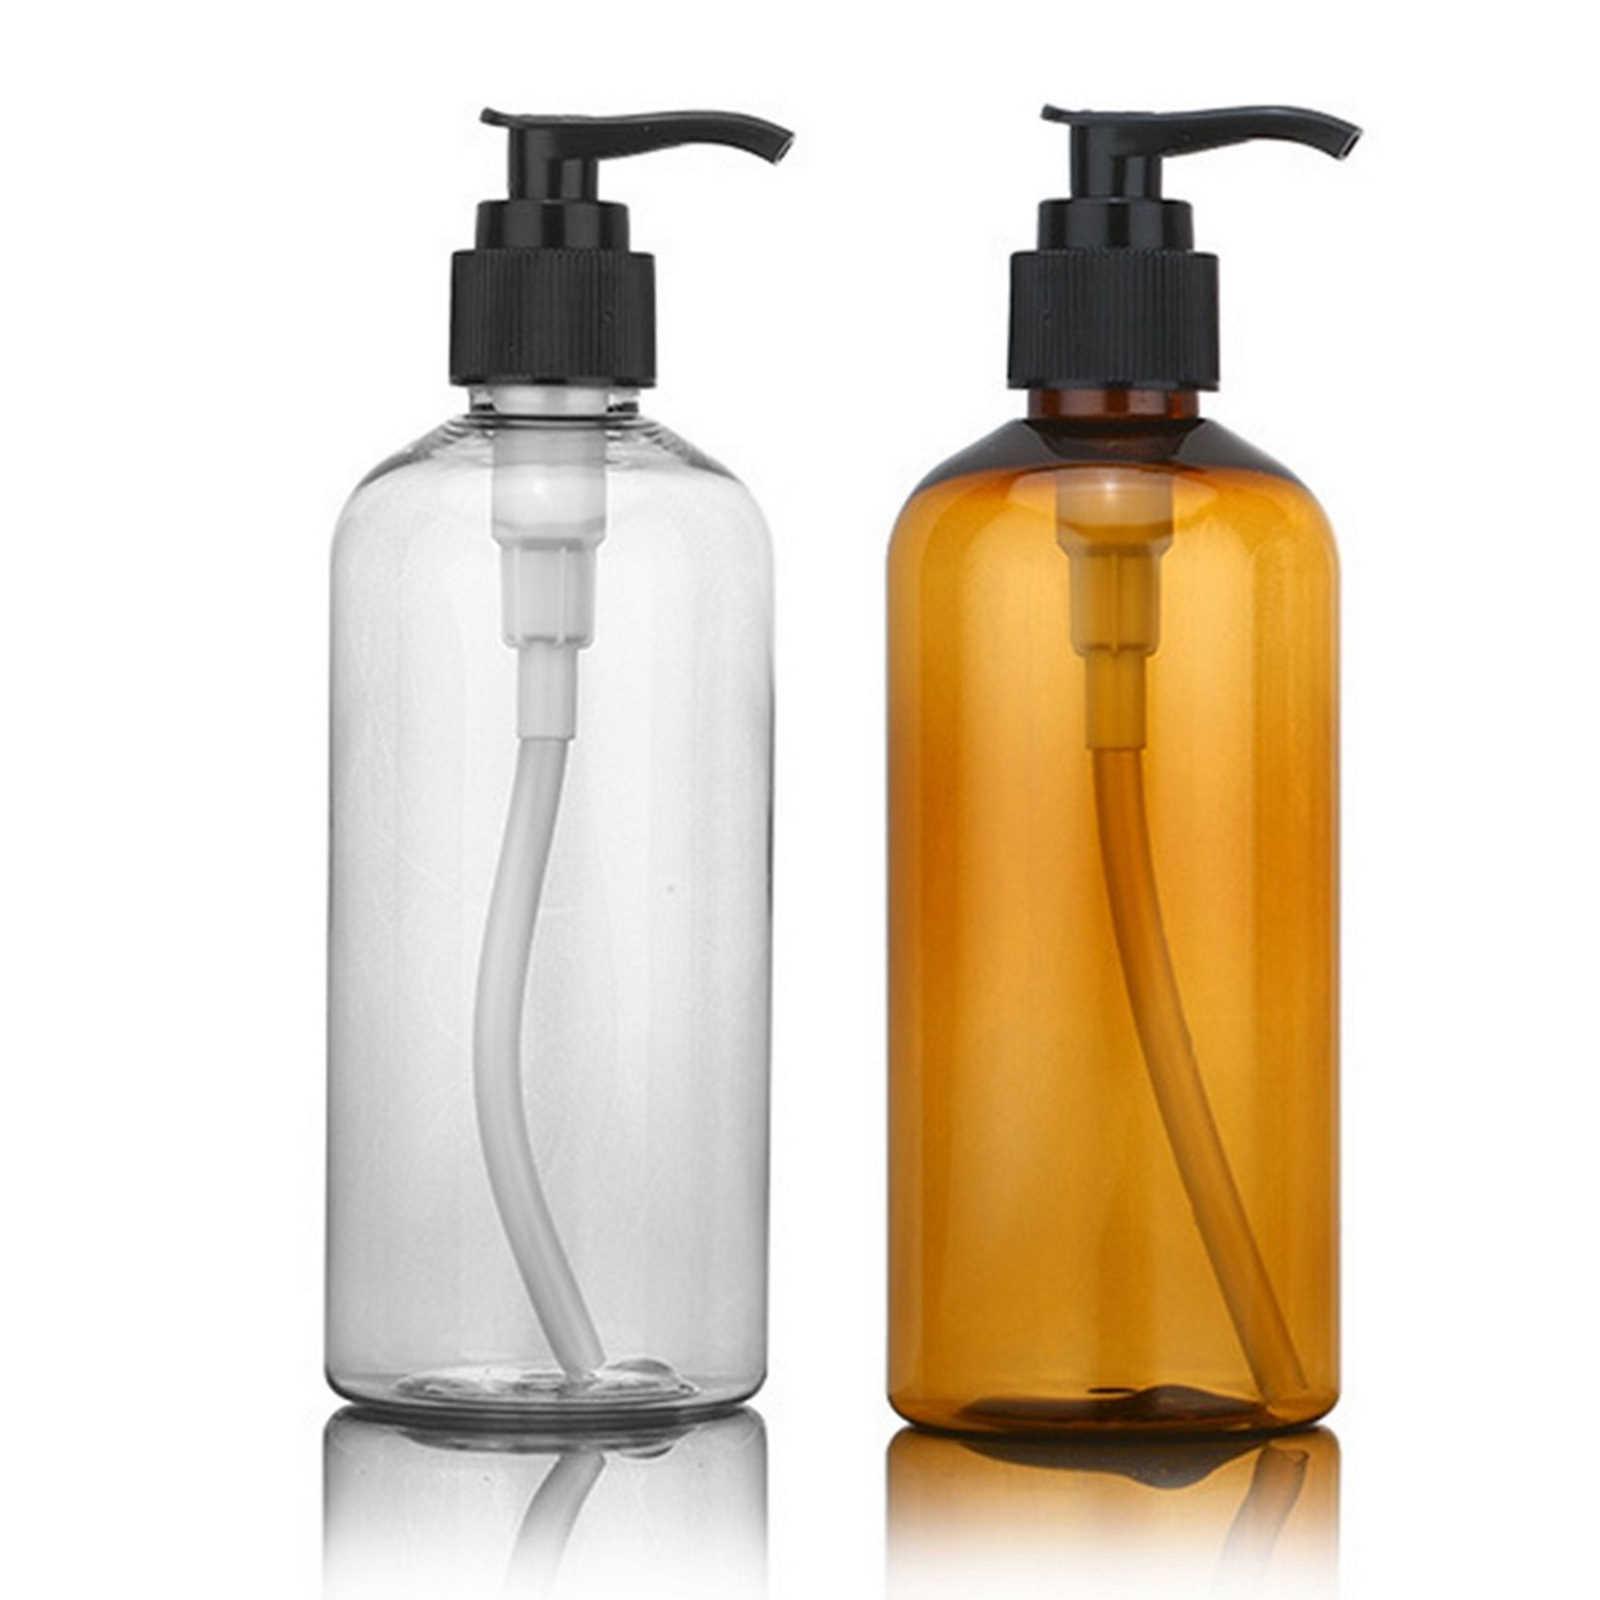 Shower Gel Bottles